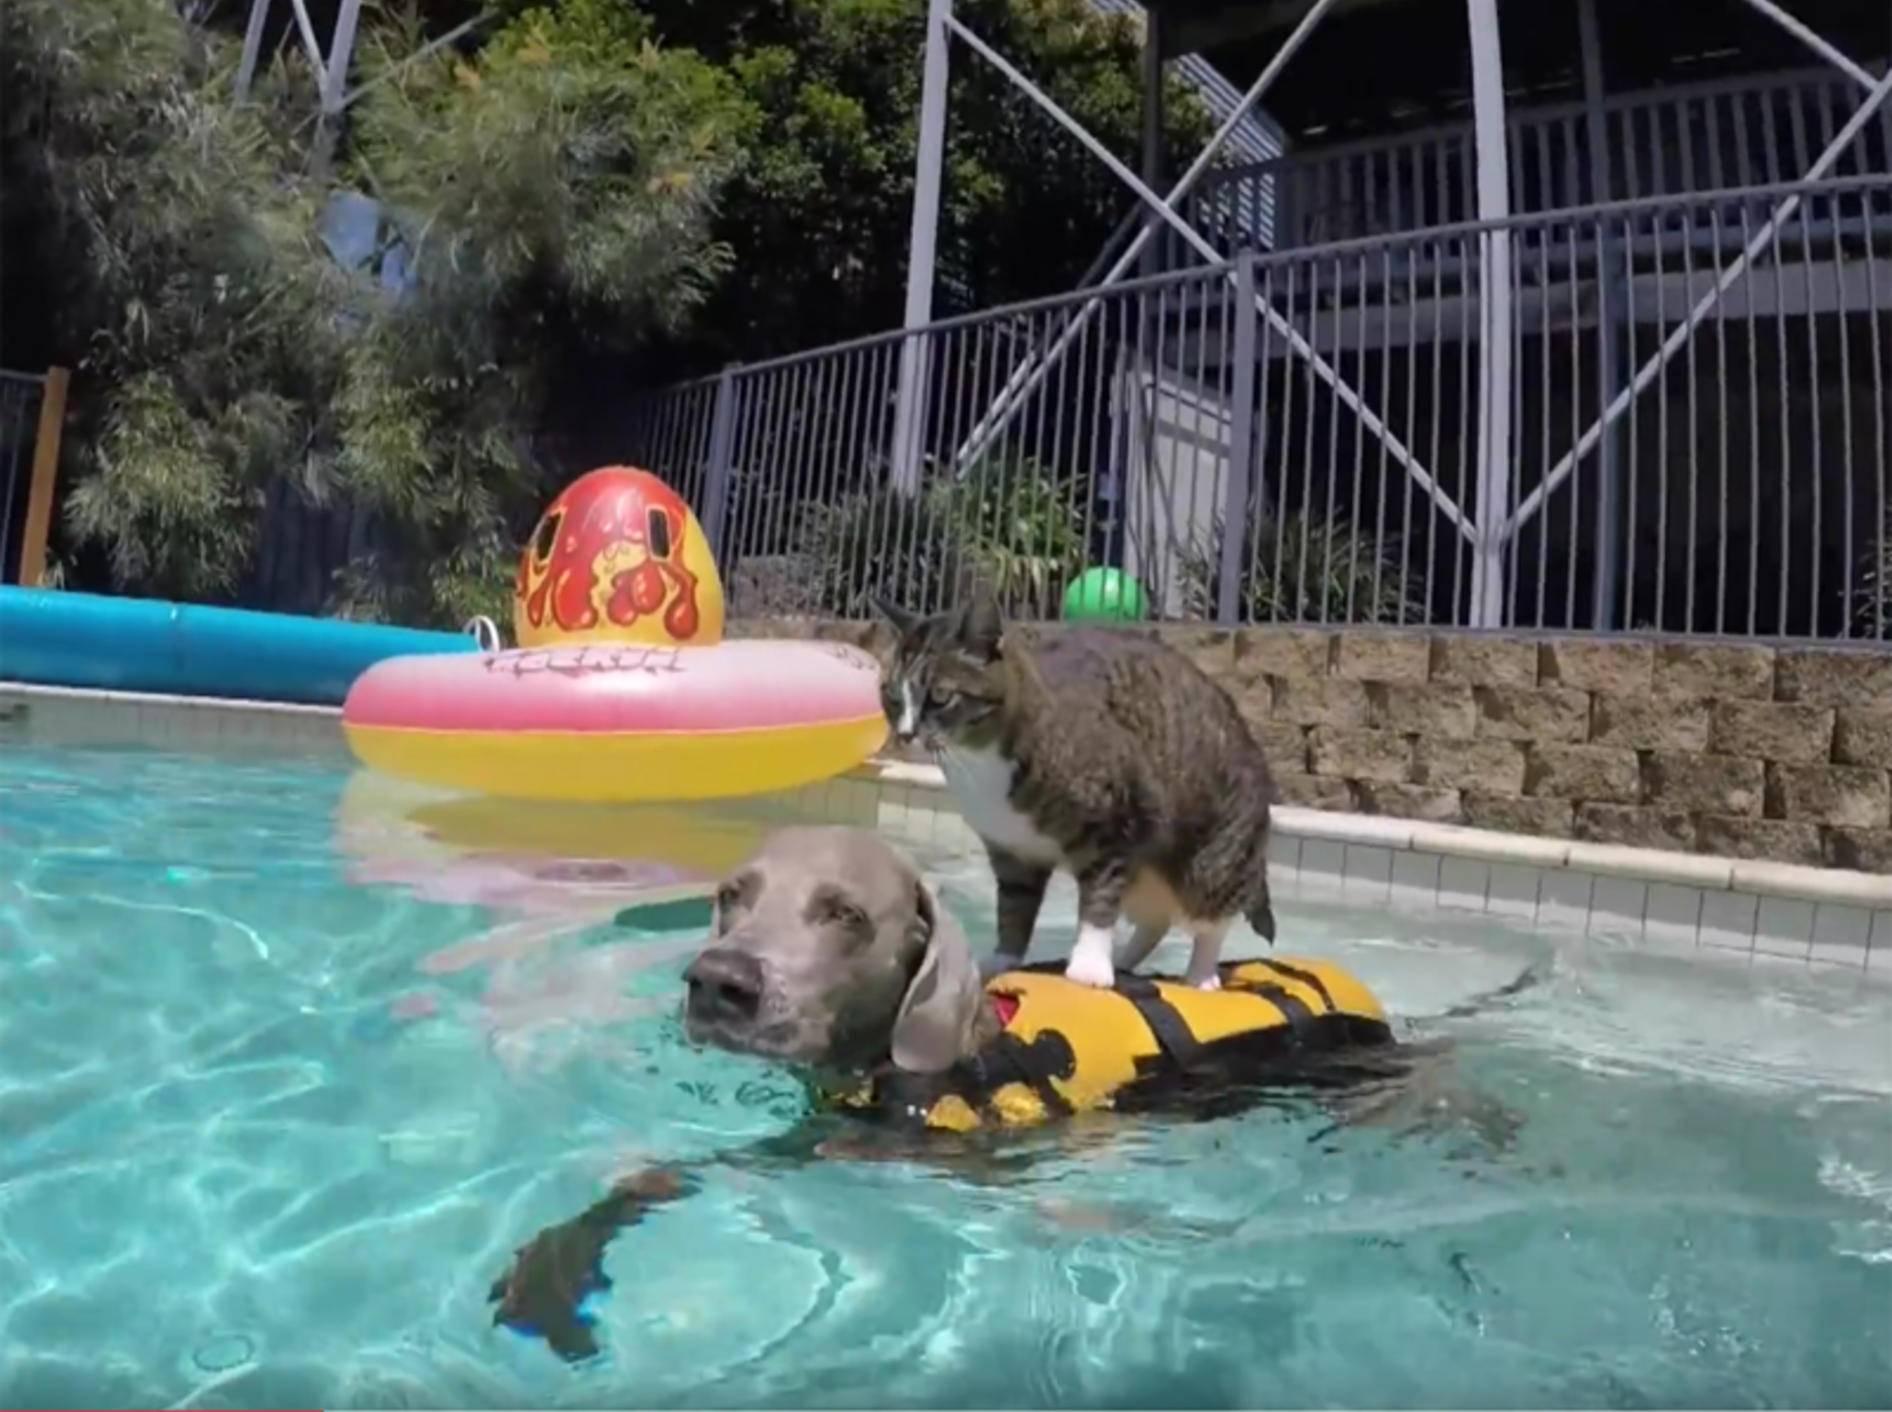 Katze Didga und Hund Ice surfen im Swimmingpool – YouTube / CATMANTOO